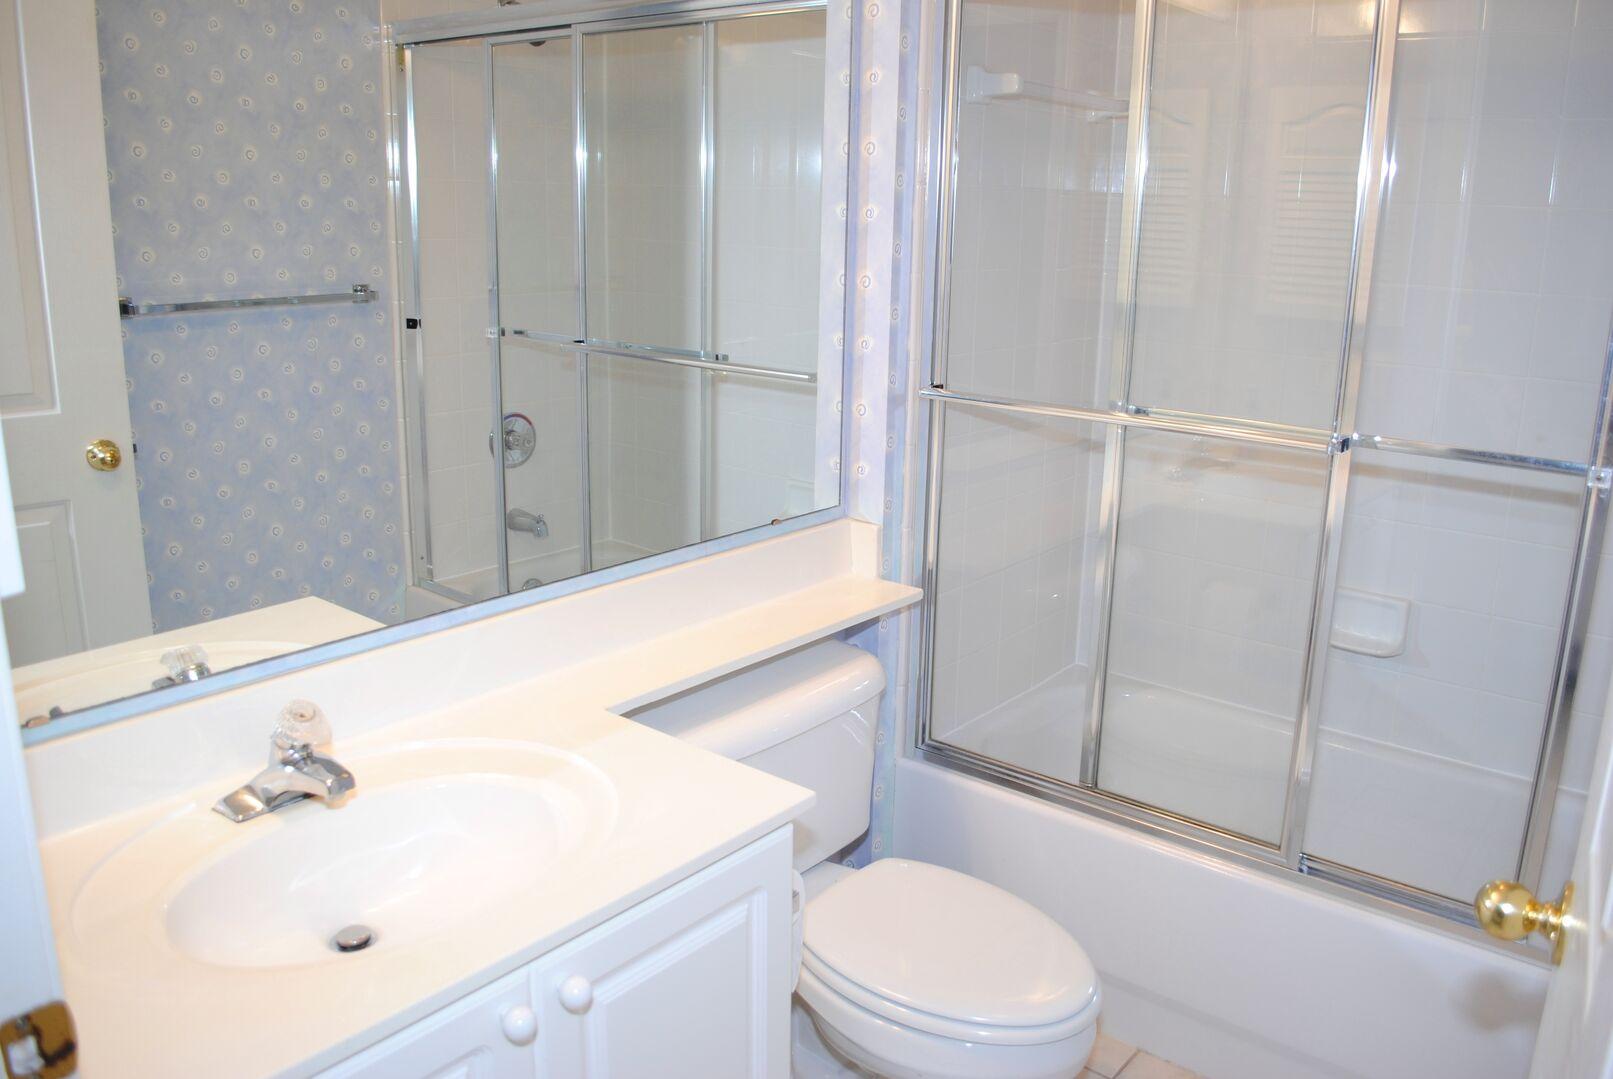 Twins Bathroom